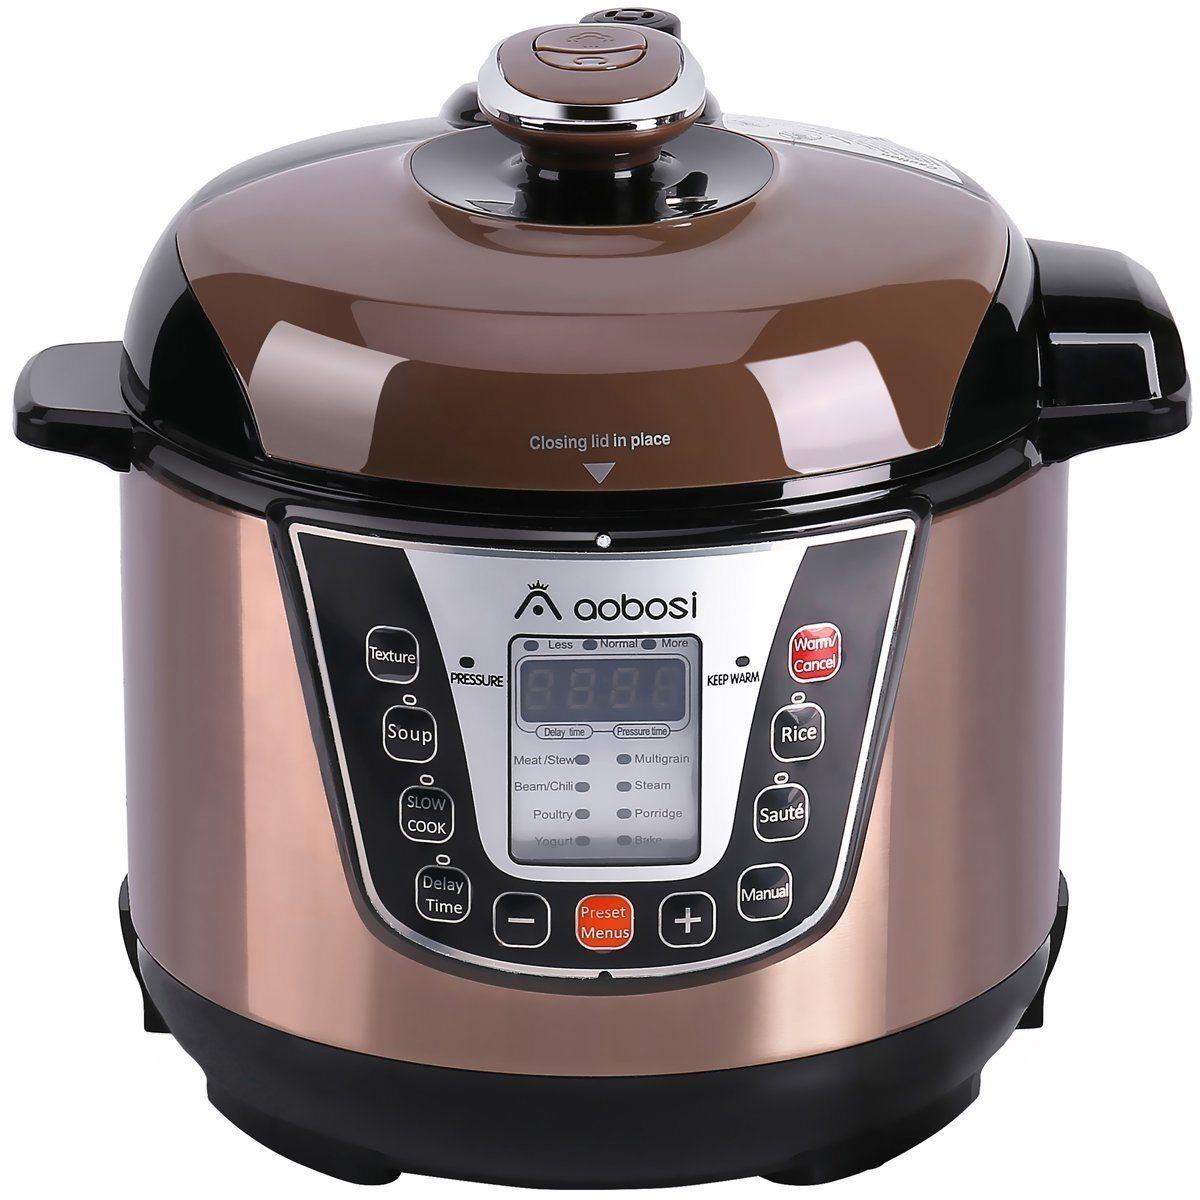 aobosi 8-in-1 mini pressure cooker